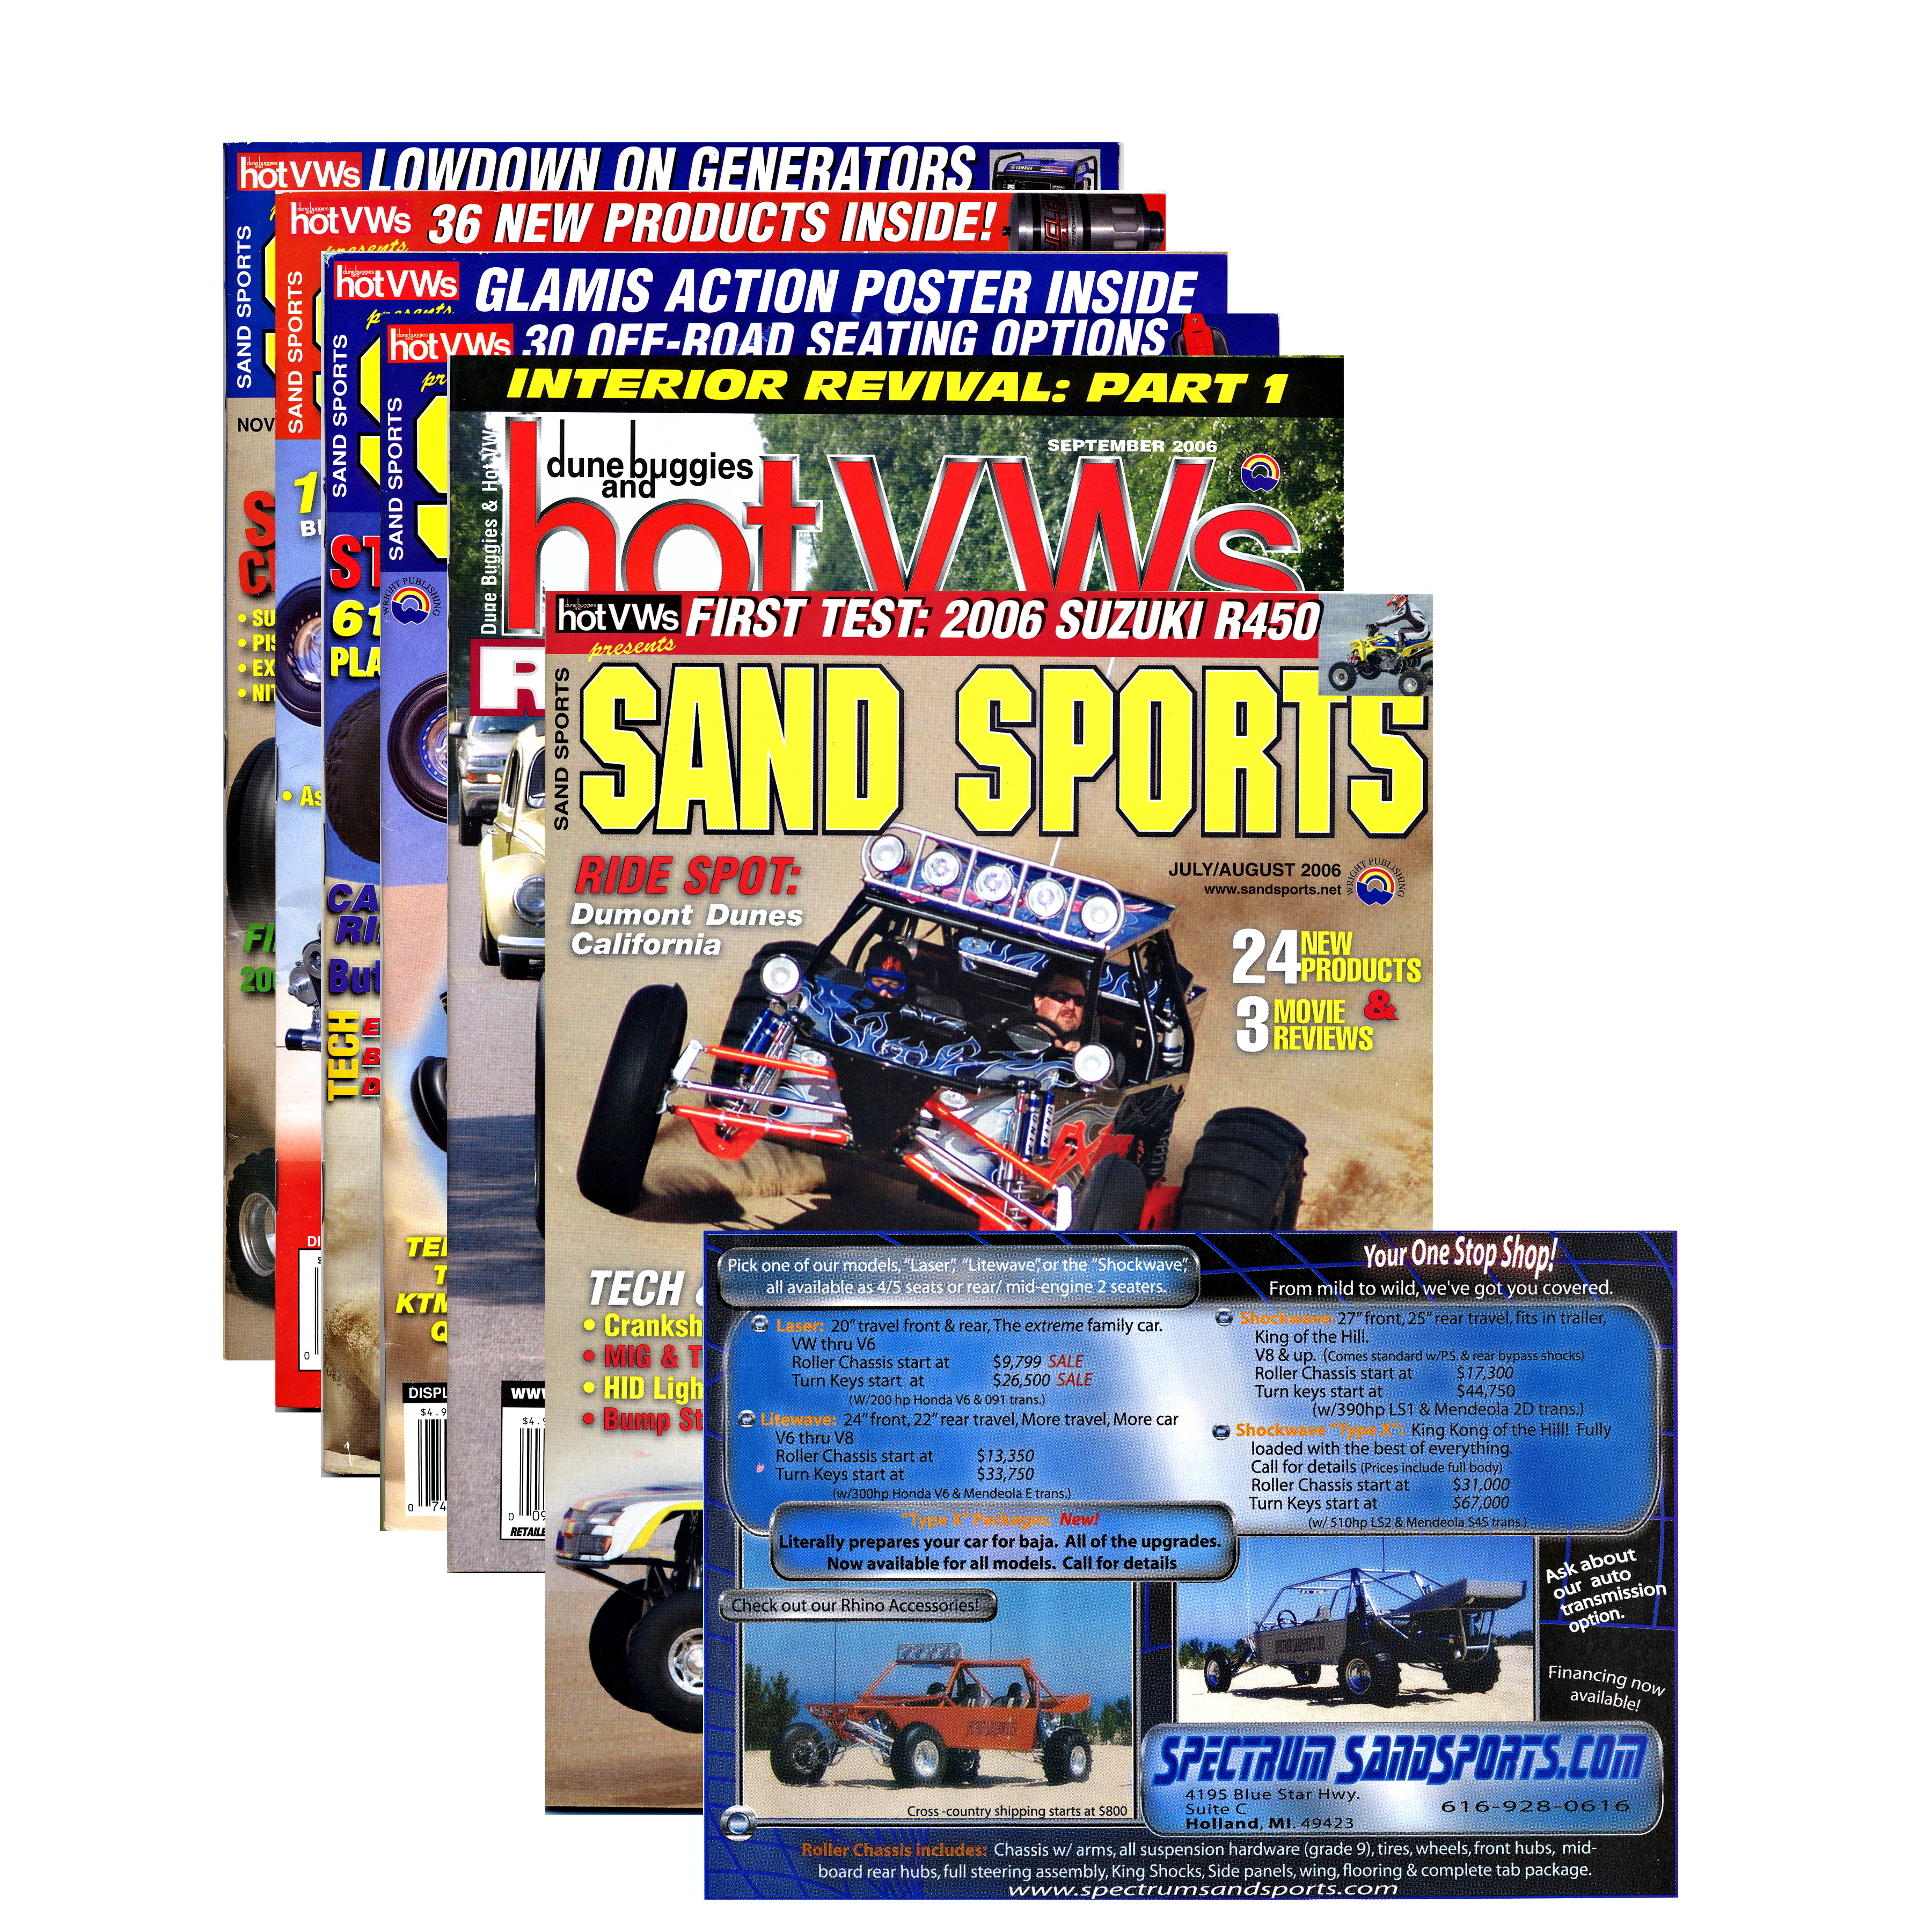 Magazine ad; Spectrum Sandsports